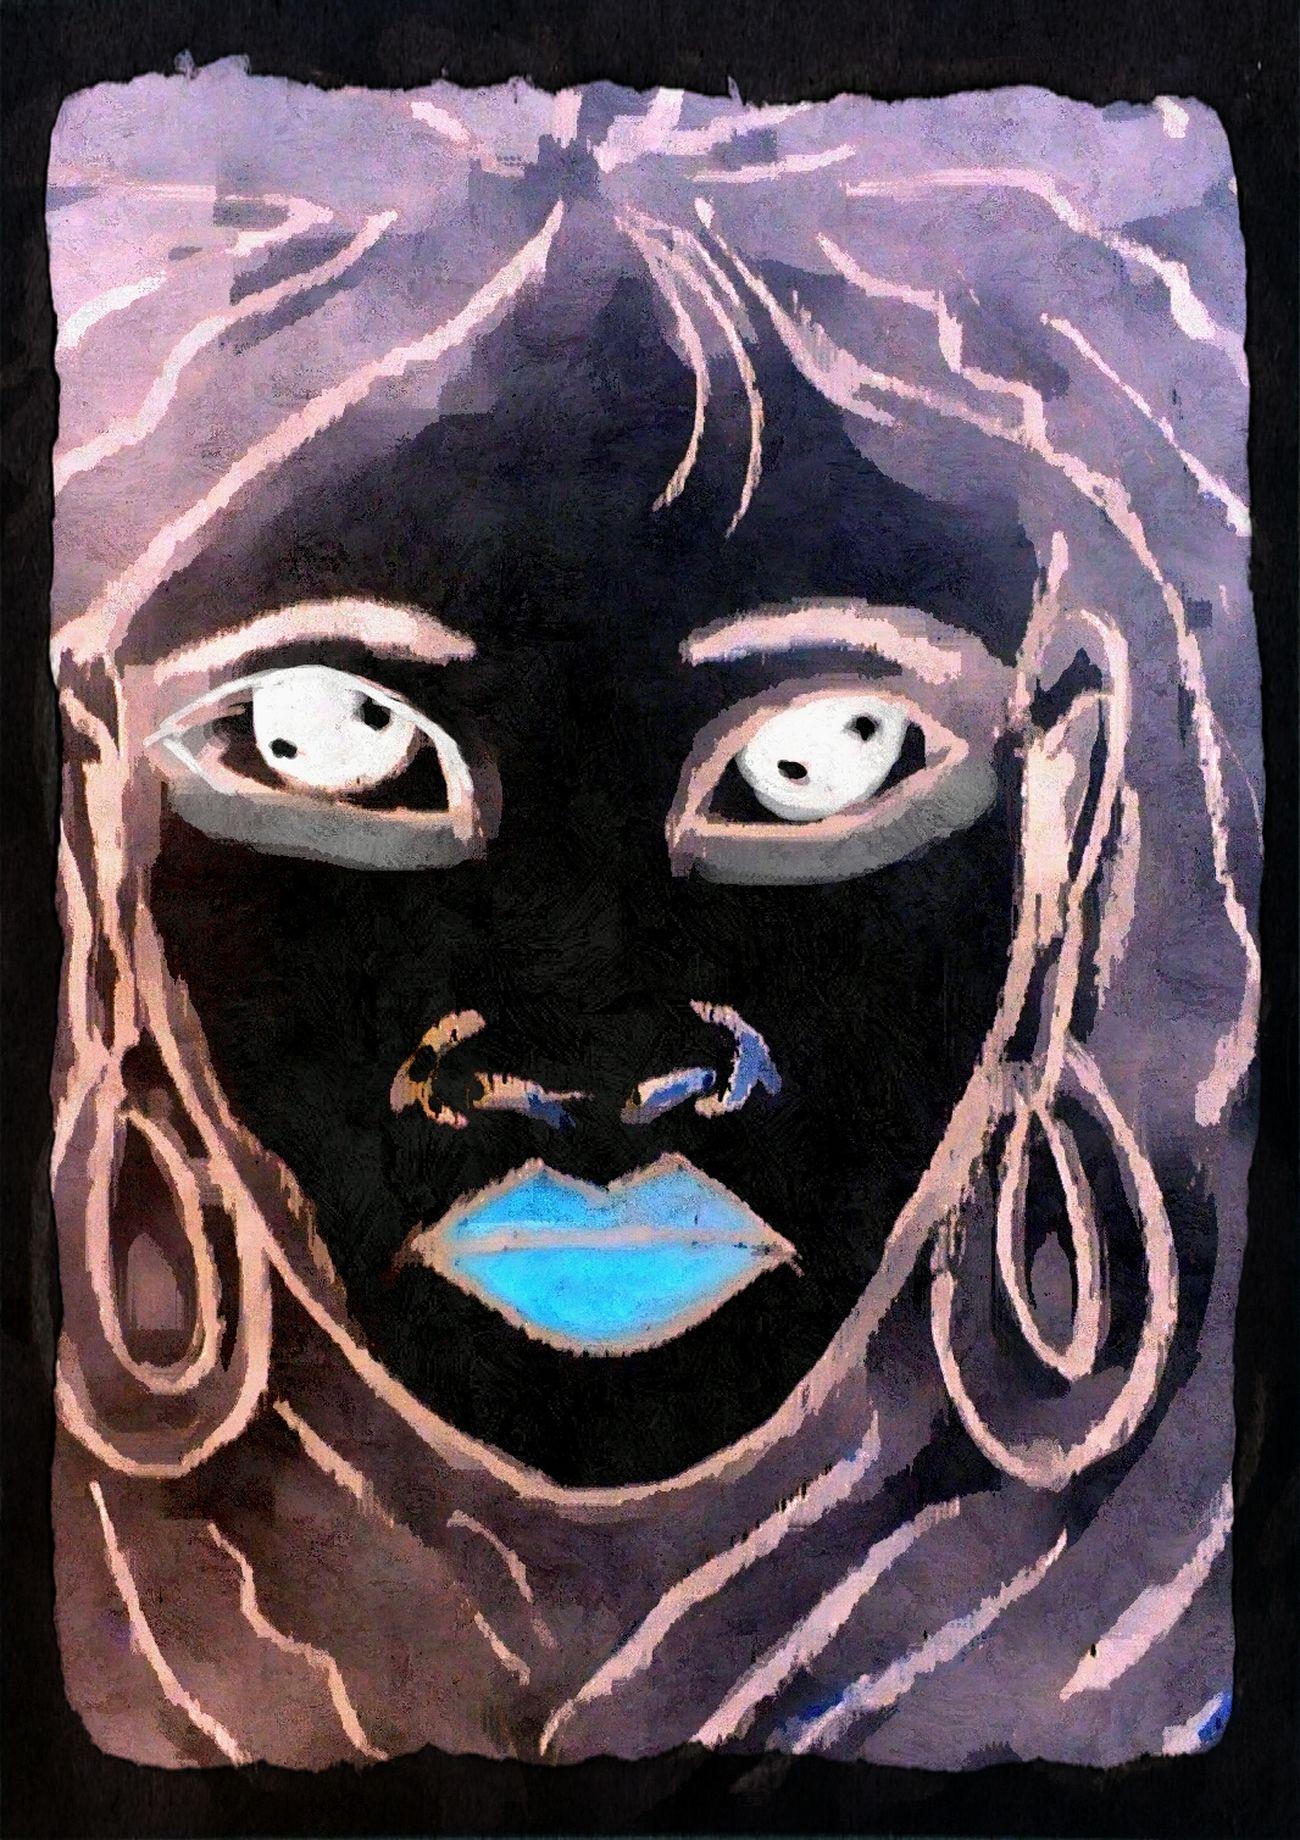 Close-up Human Representation Creativity Drawing - Activity Art And Craft Drawing - Art Product Textured